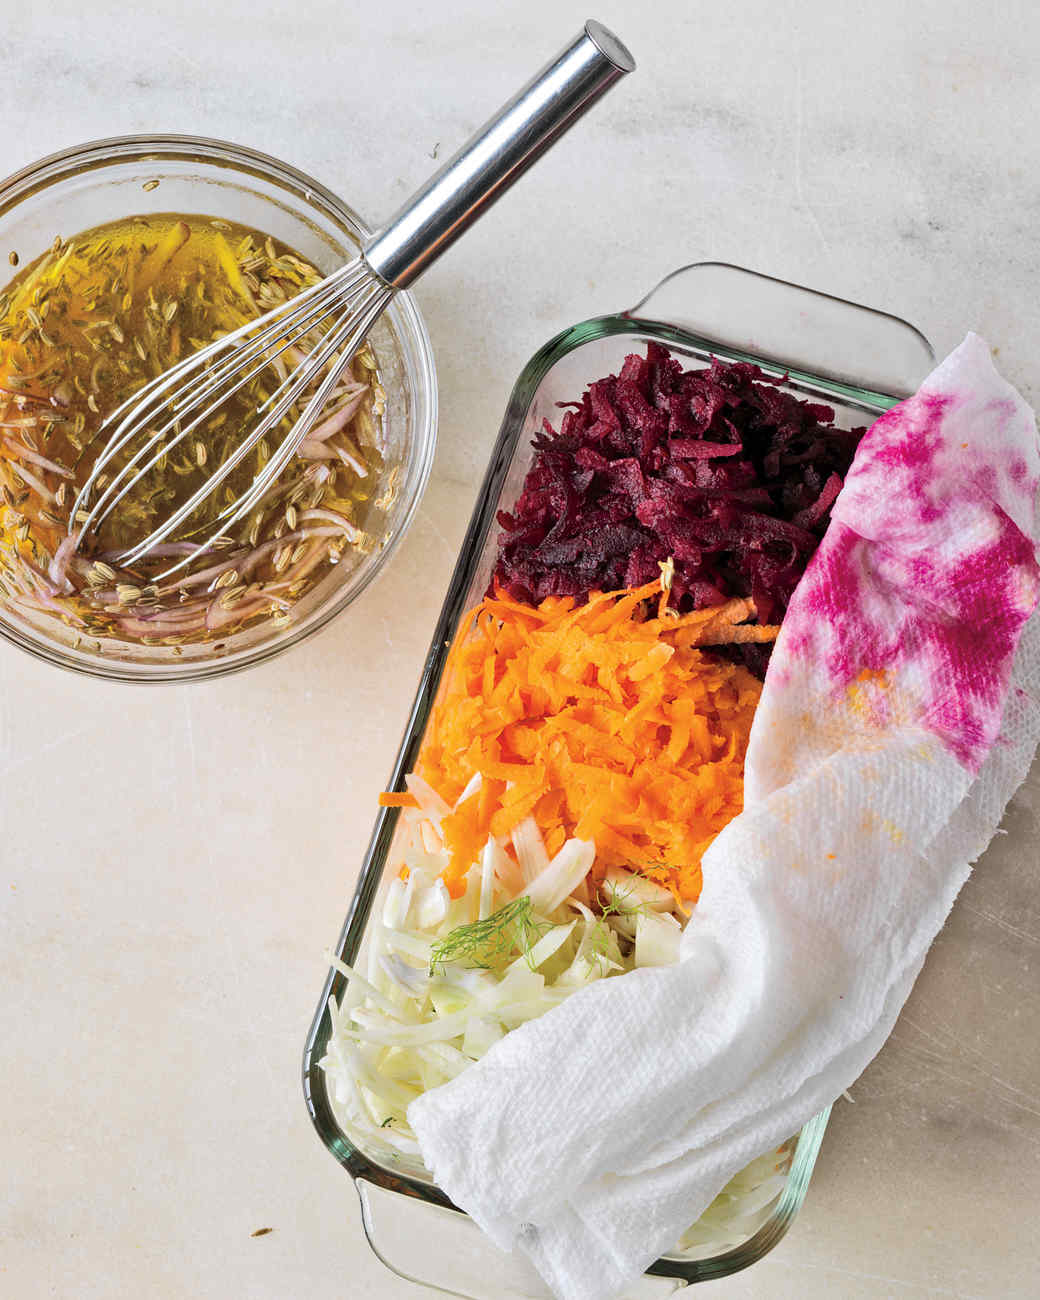 beet-fennel-carrot-salad-2-md107770.jpg